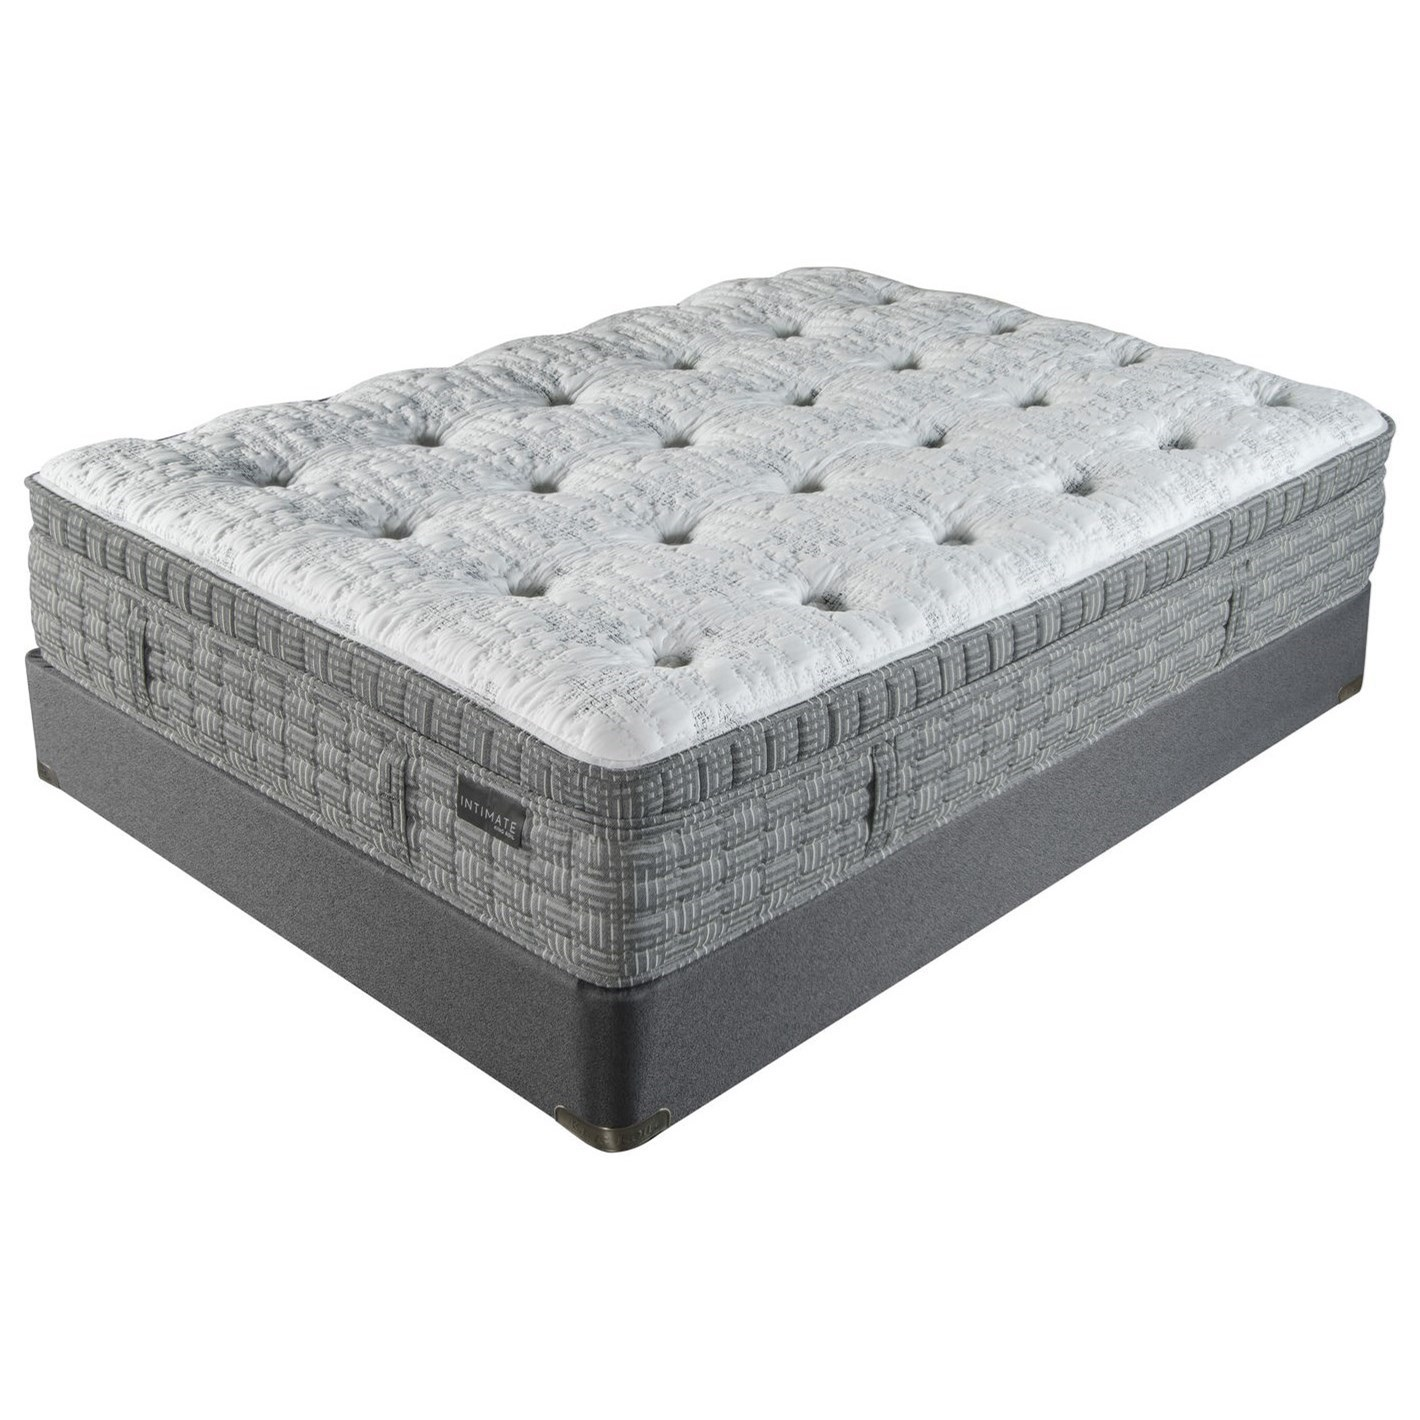 "Palisades Med Lux Top Twin XL 15"" Medium Luxury Top Mattress Set by King Koil at Pilgrim Furniture City"